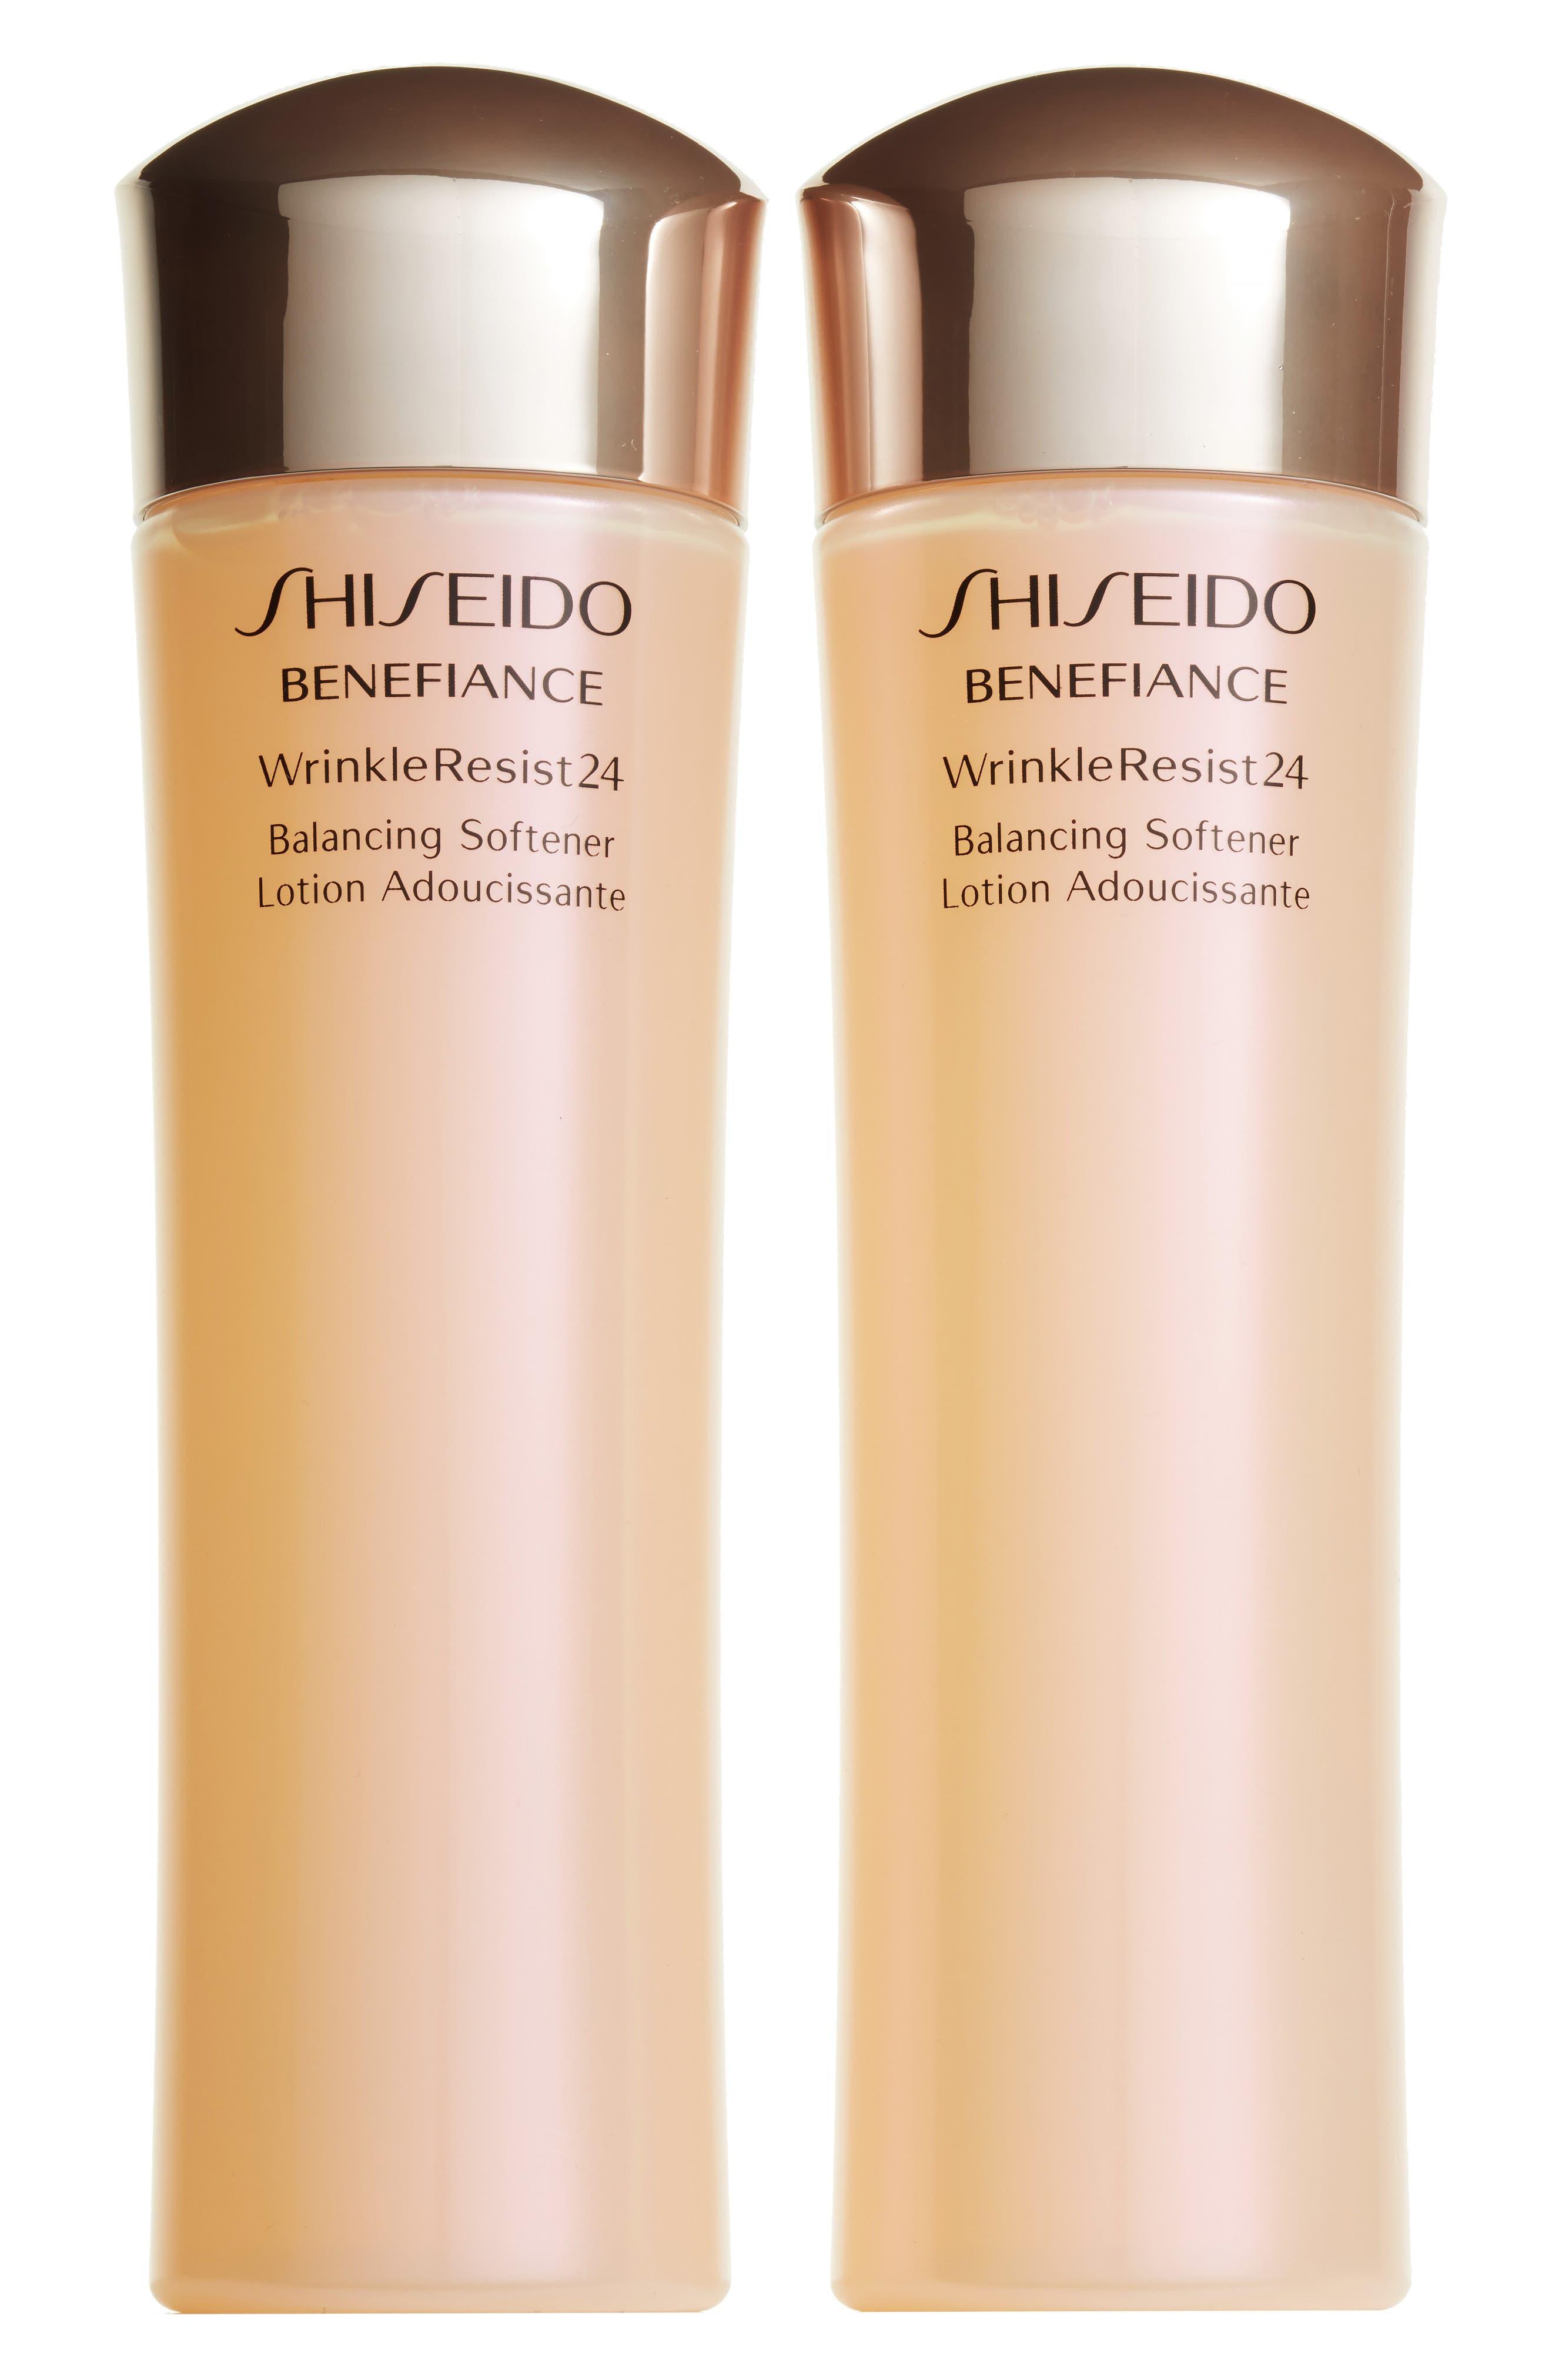 Shiseido Benefiance WrinkleResist24 Balancing Softener Duo ($146 Value)